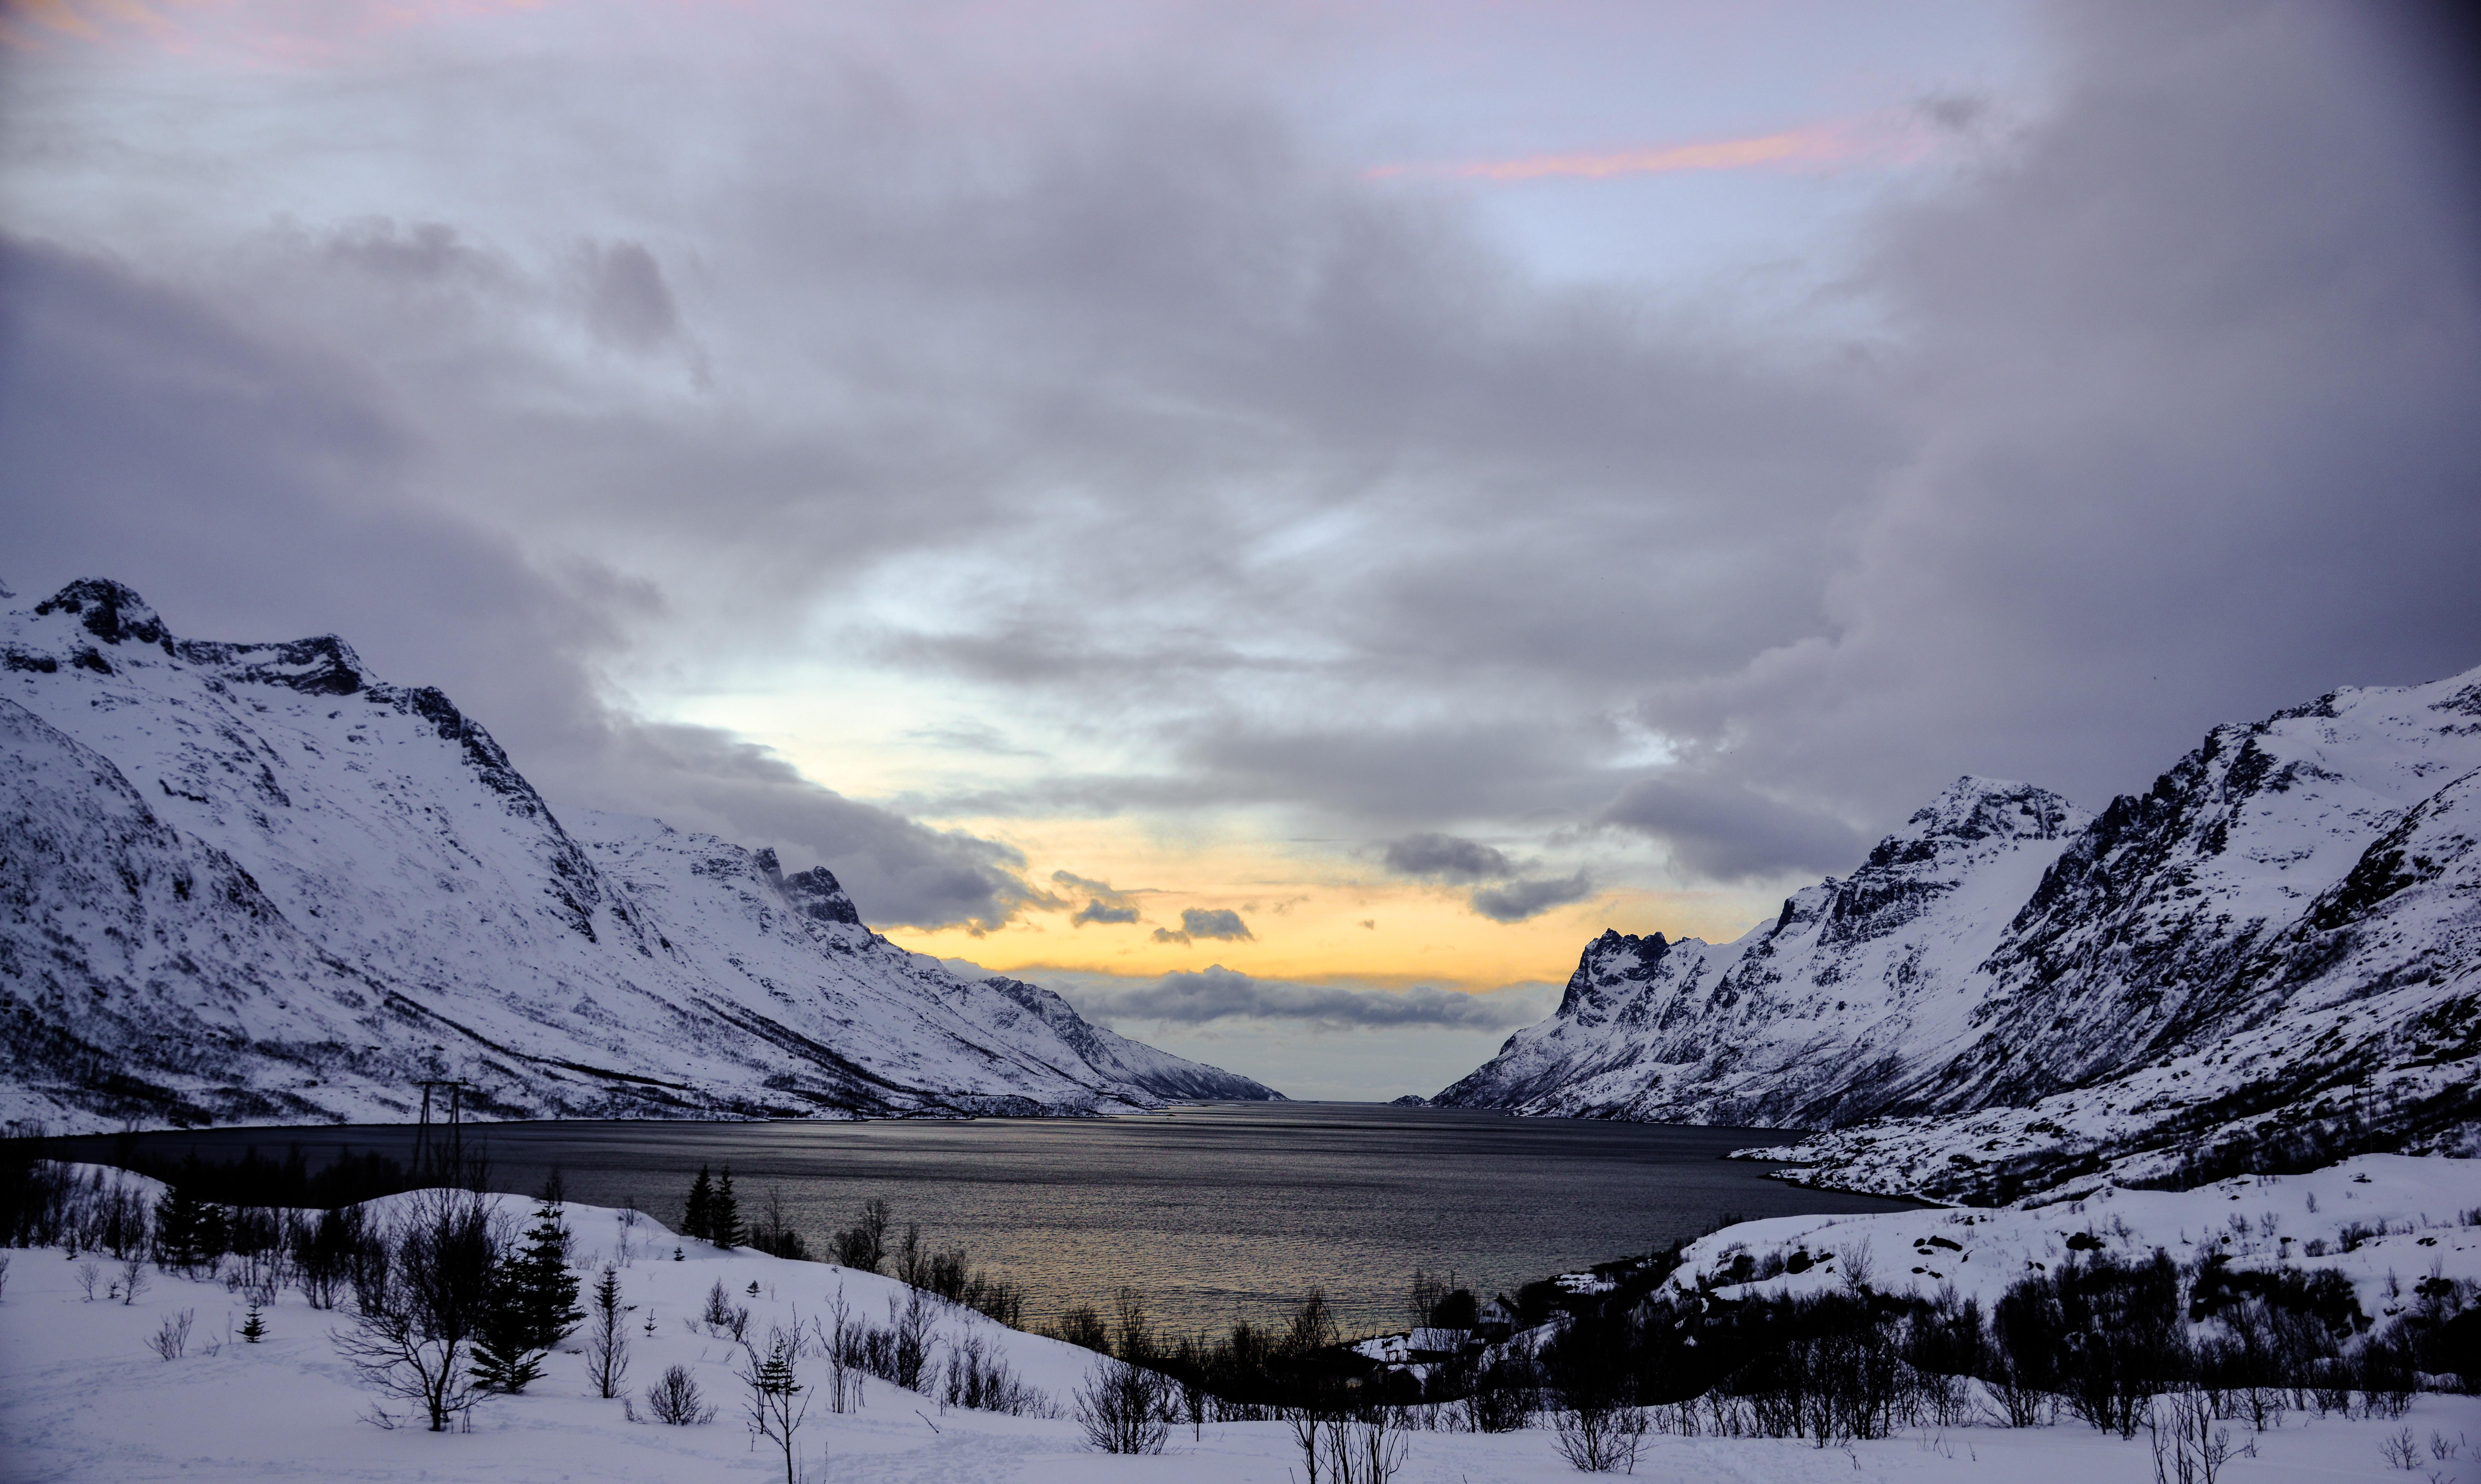 Sunset at Ersfjord, Senja, Norway